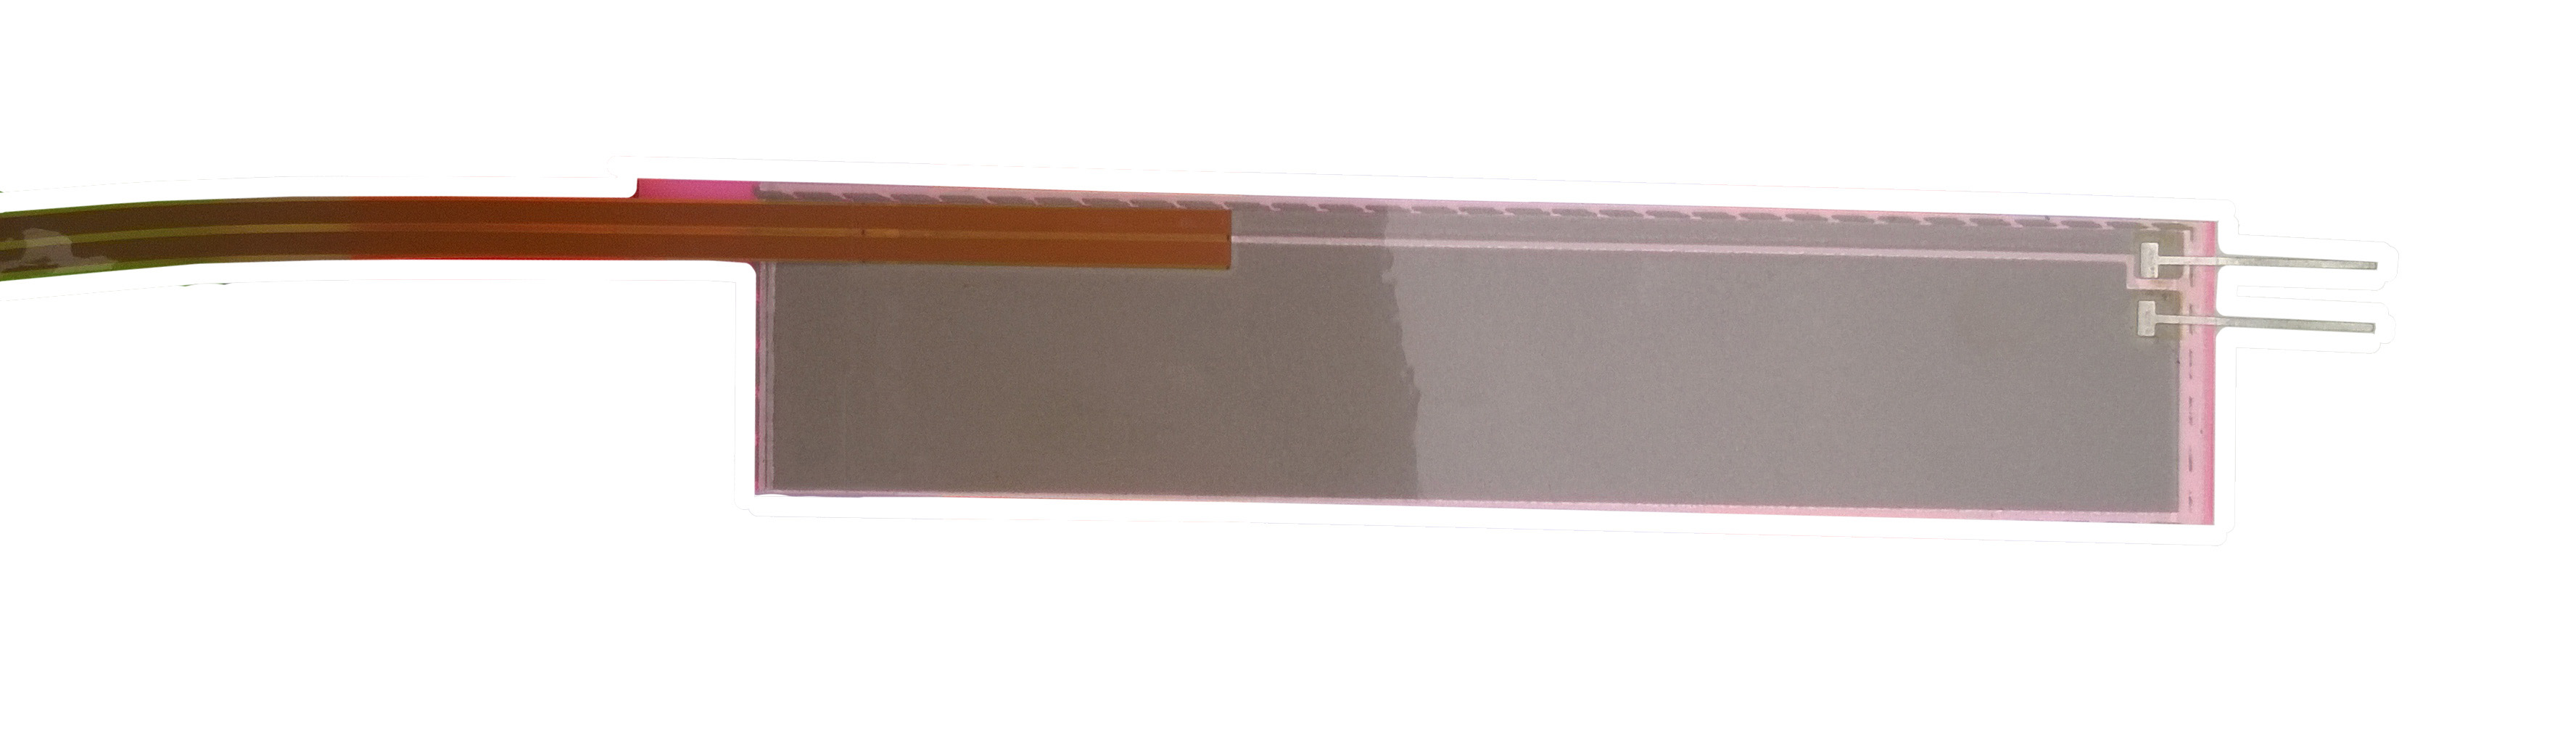 23mm x 120mm-el-panel-replacement-Backlights-EL1-reverside